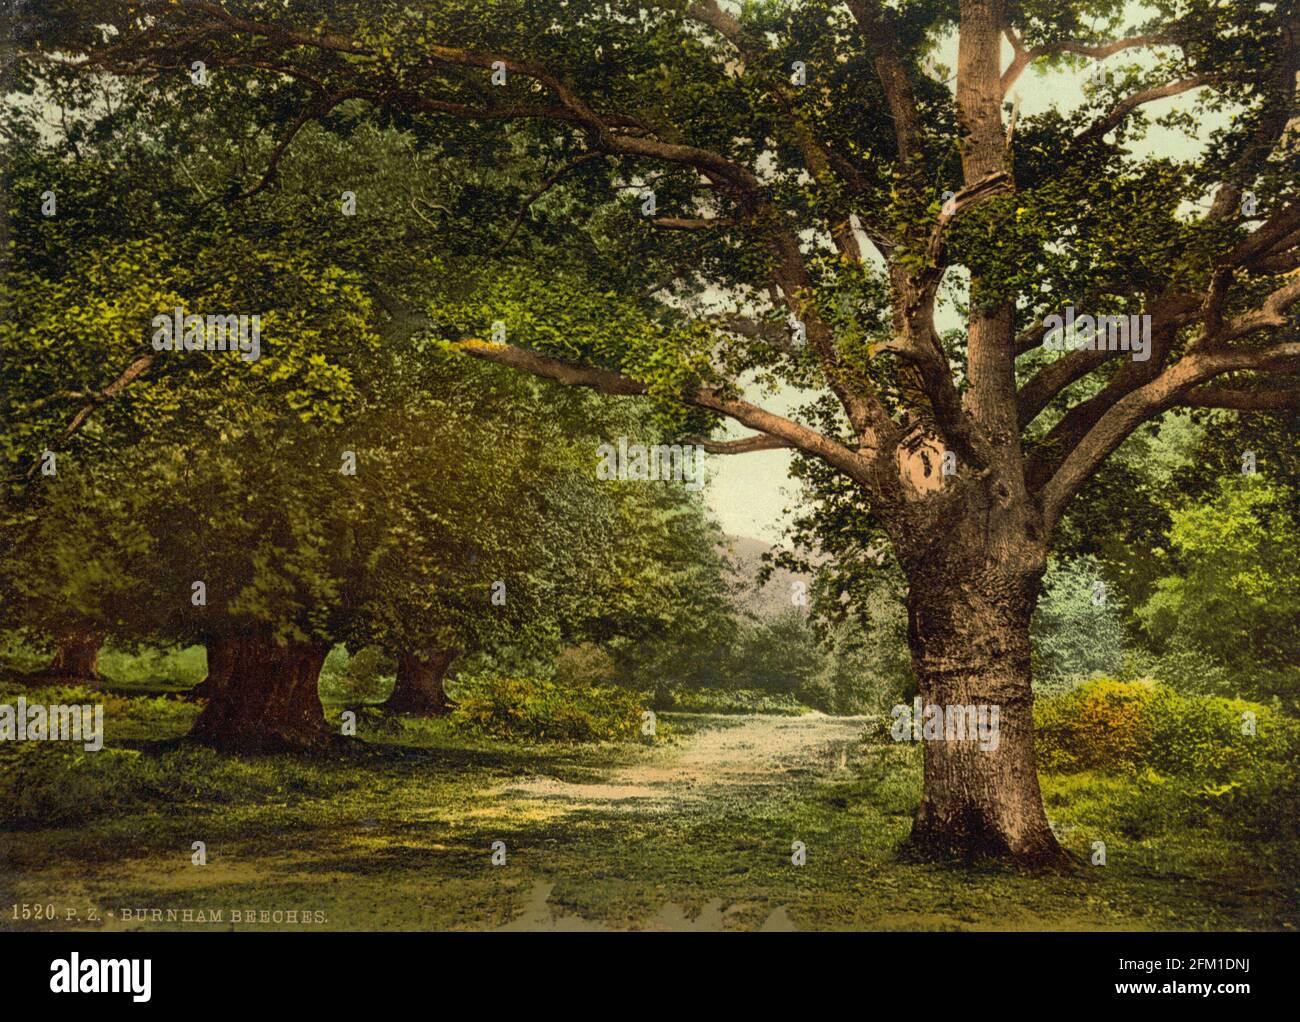 Burnham Beeches dans Buckinghamshire vers 1890-1900 Banque D'Images